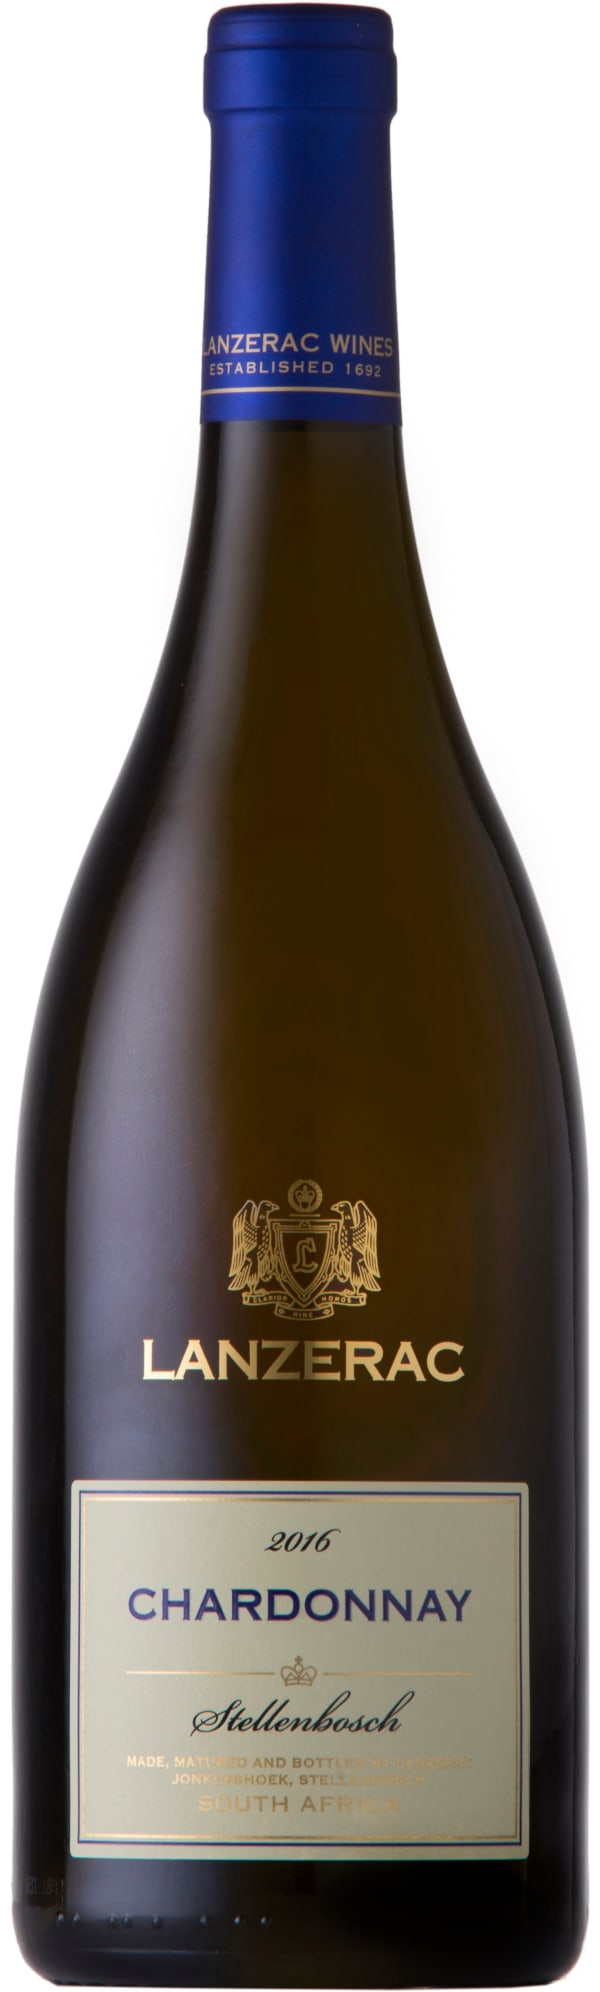 Lanzerac Chardonnay 2019